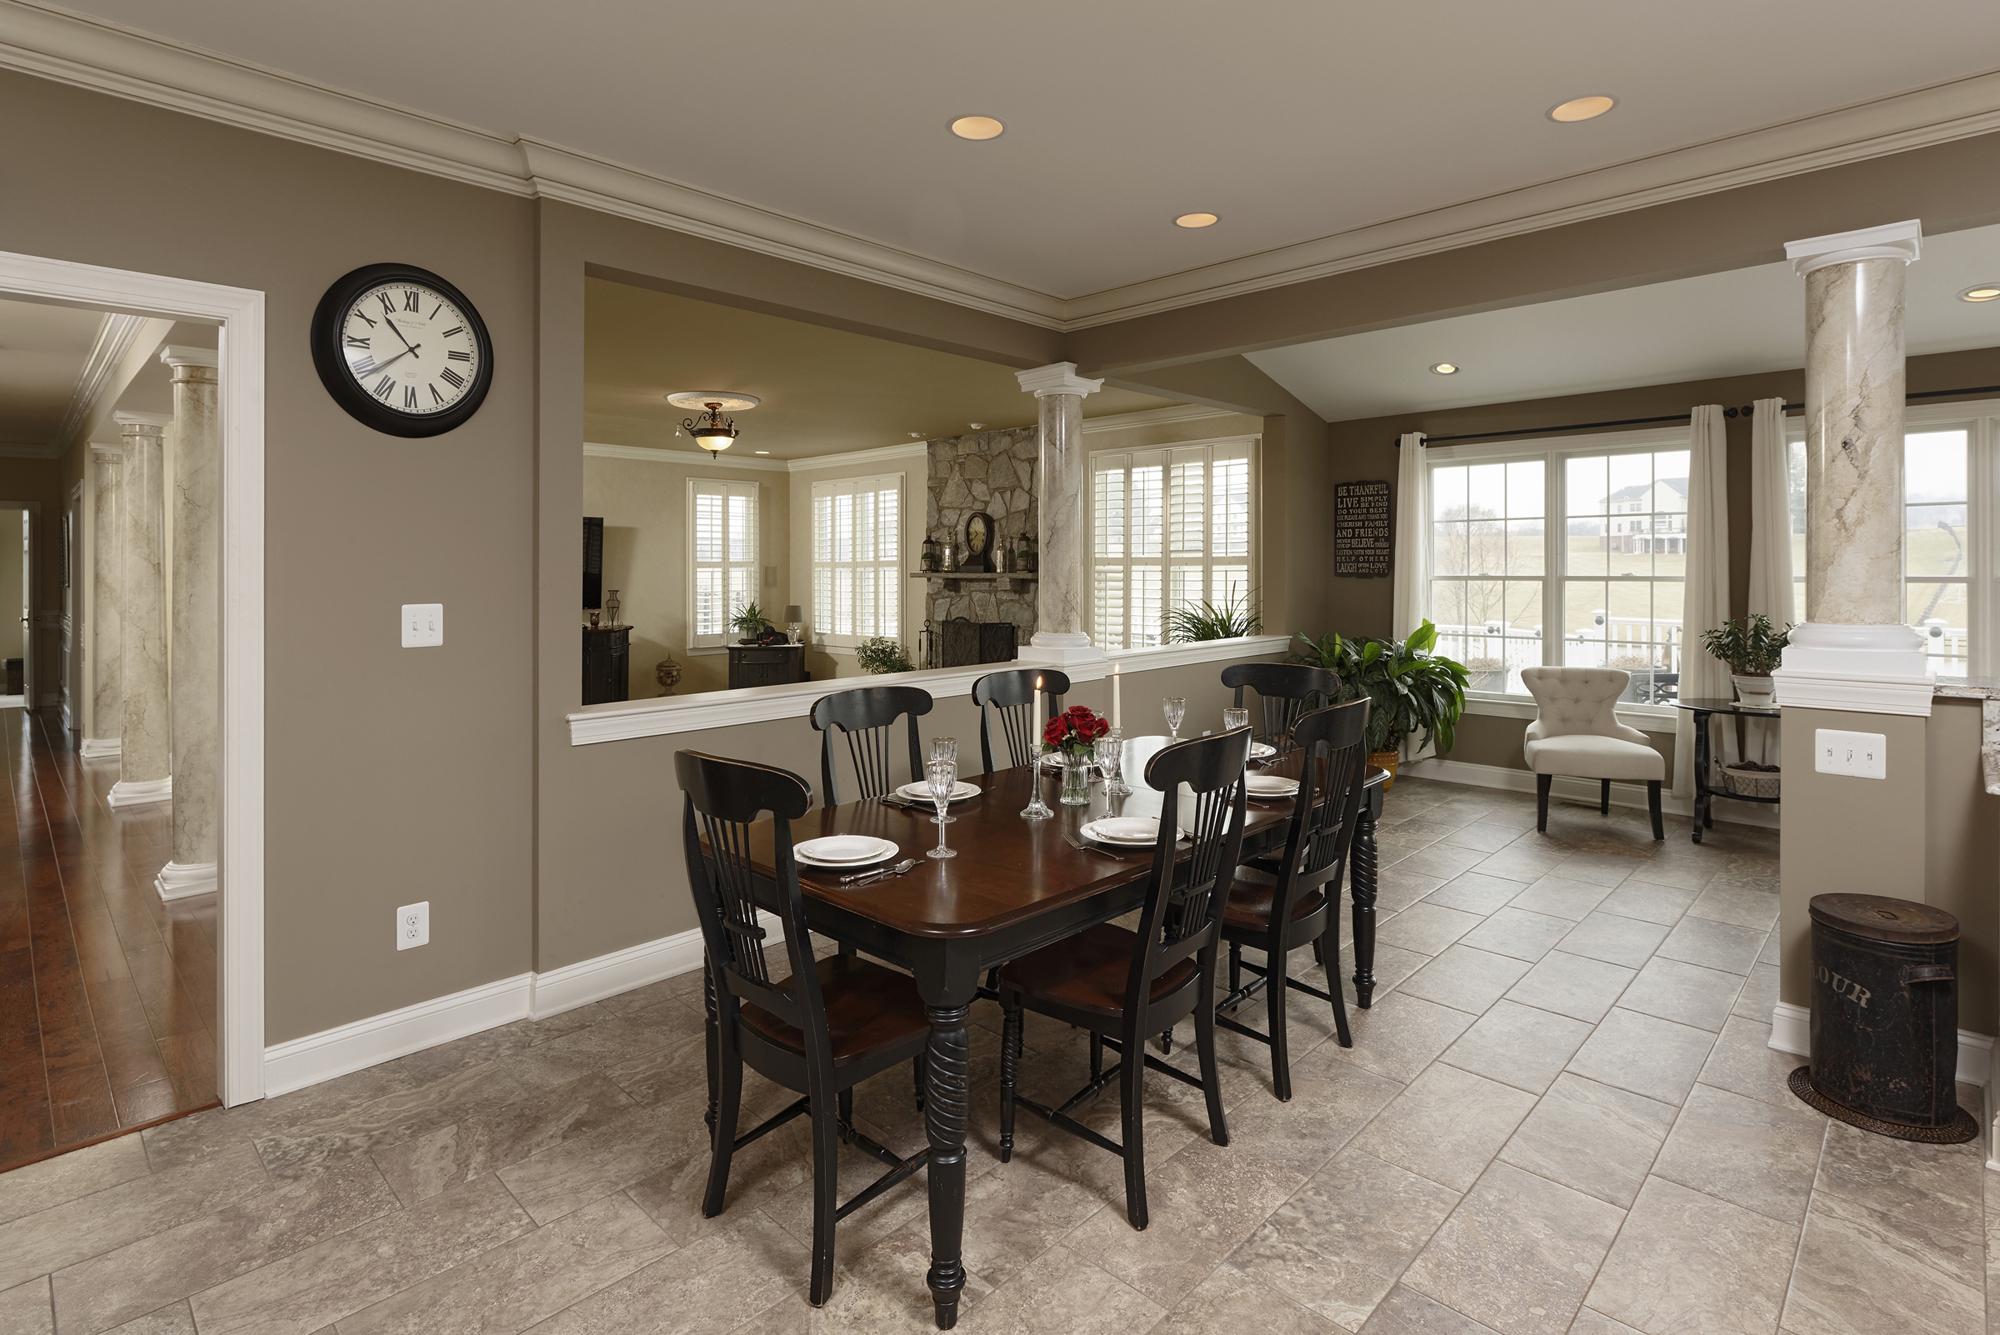 Spectacular Kitchen Family Room Renovation In Leesburg, Virginia